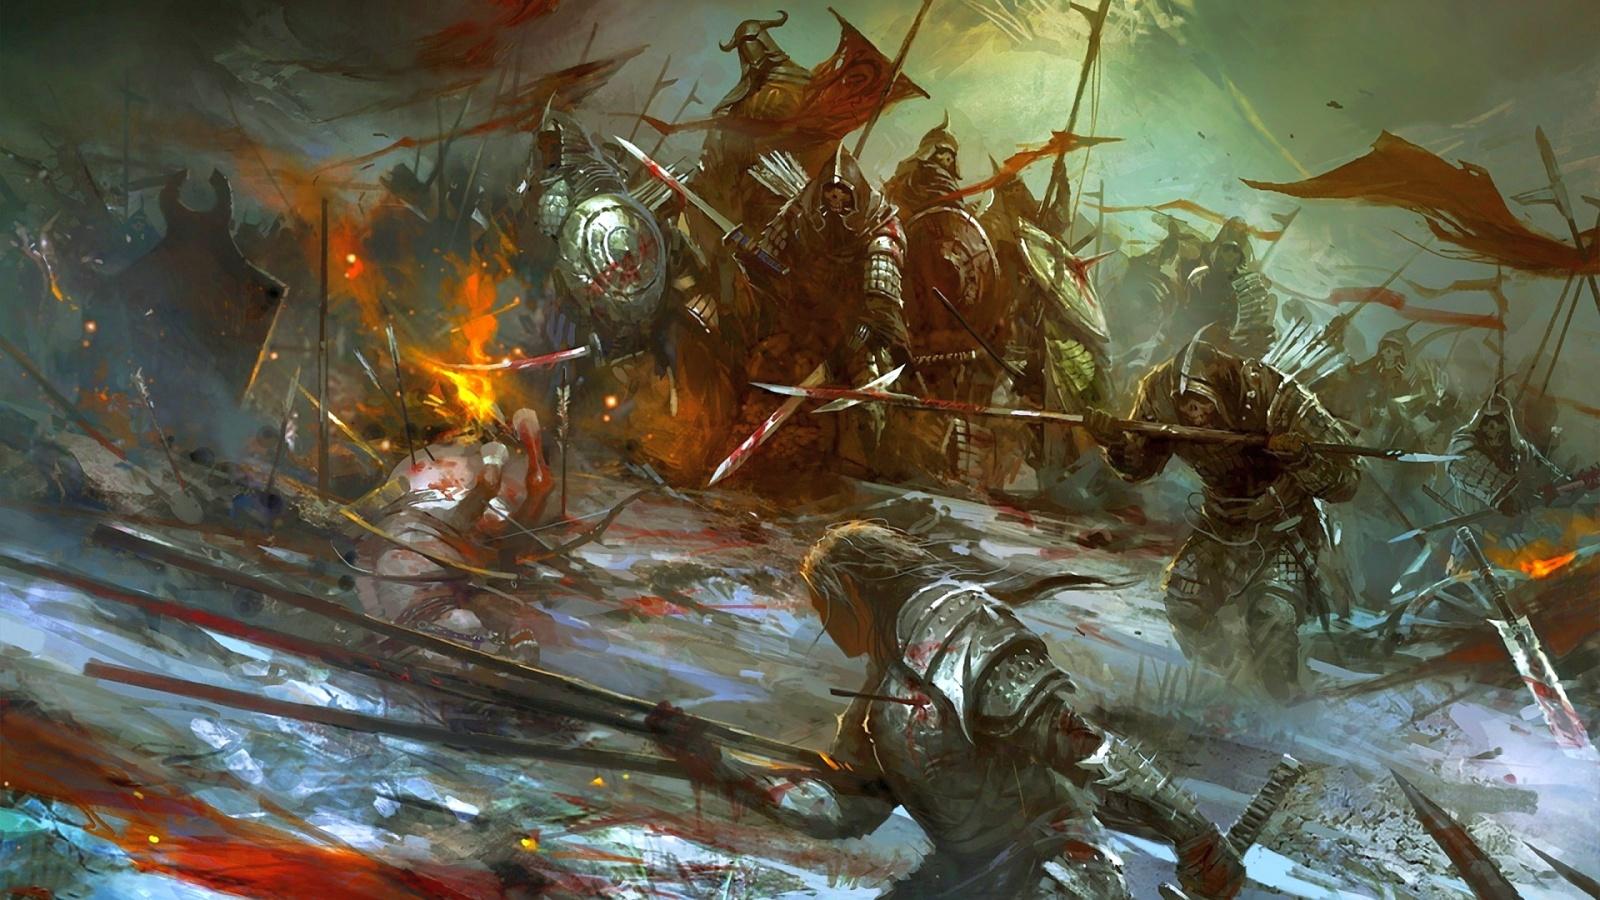 Description: The Wallpaper above is Fantasy warrior monsters battle Wallpaper in Resolution 1600x900. Choose your Resolution and Download Fantasy warrior ...